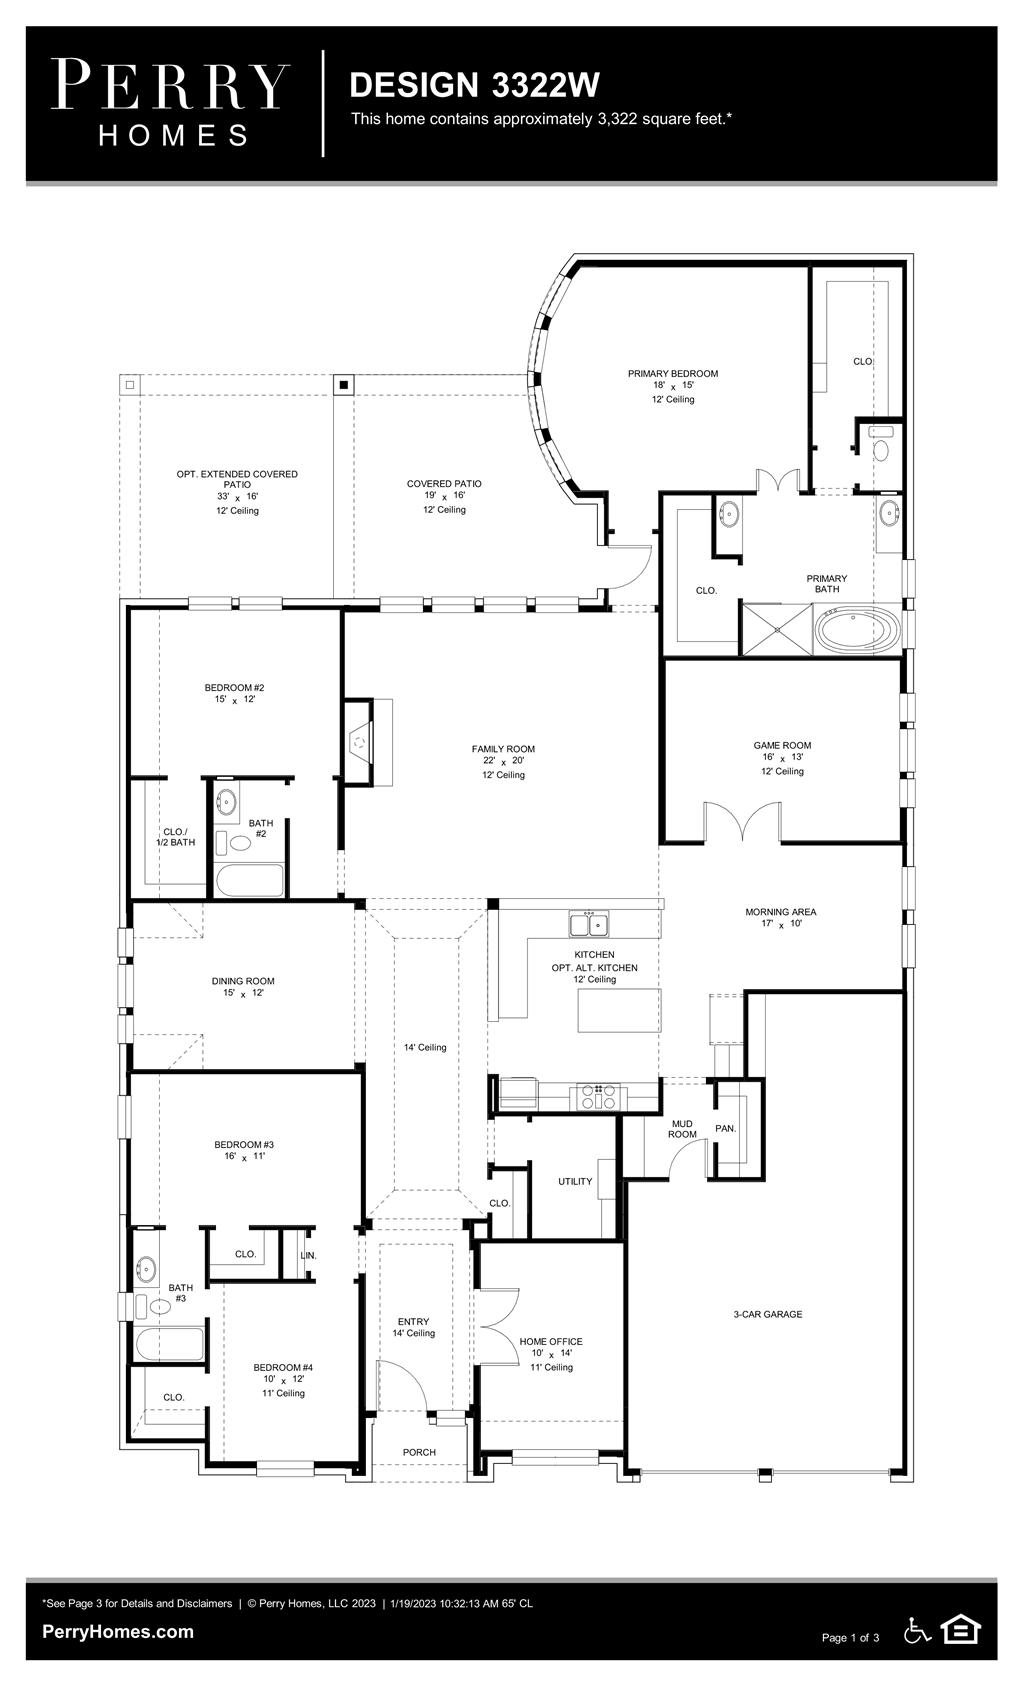 Floor Plan for 3322W